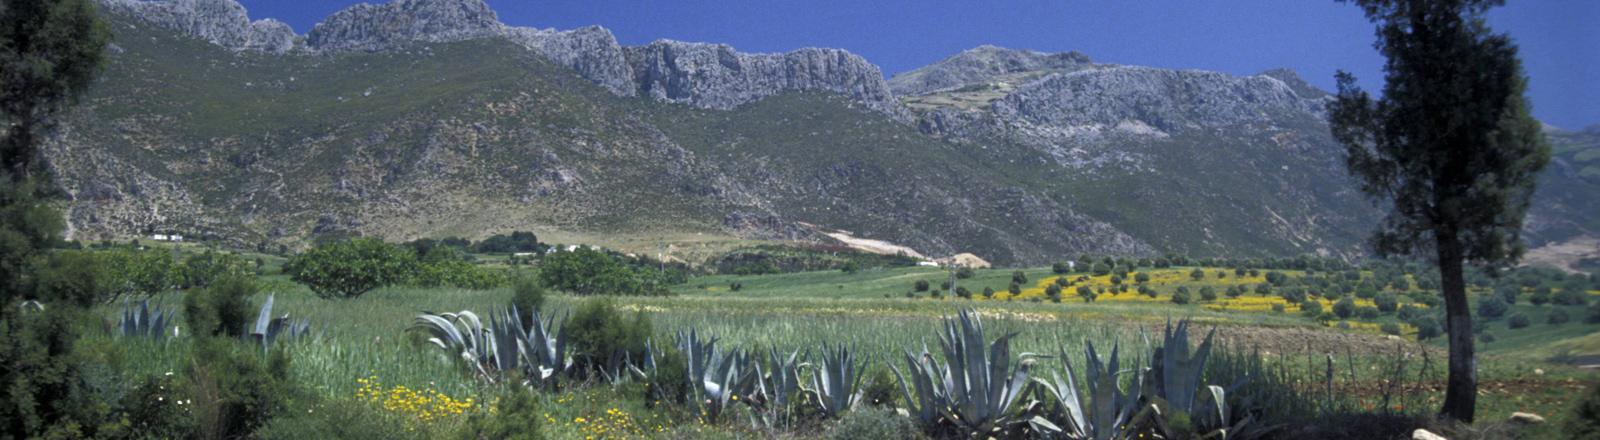 Rif-Gebirge in Marokko